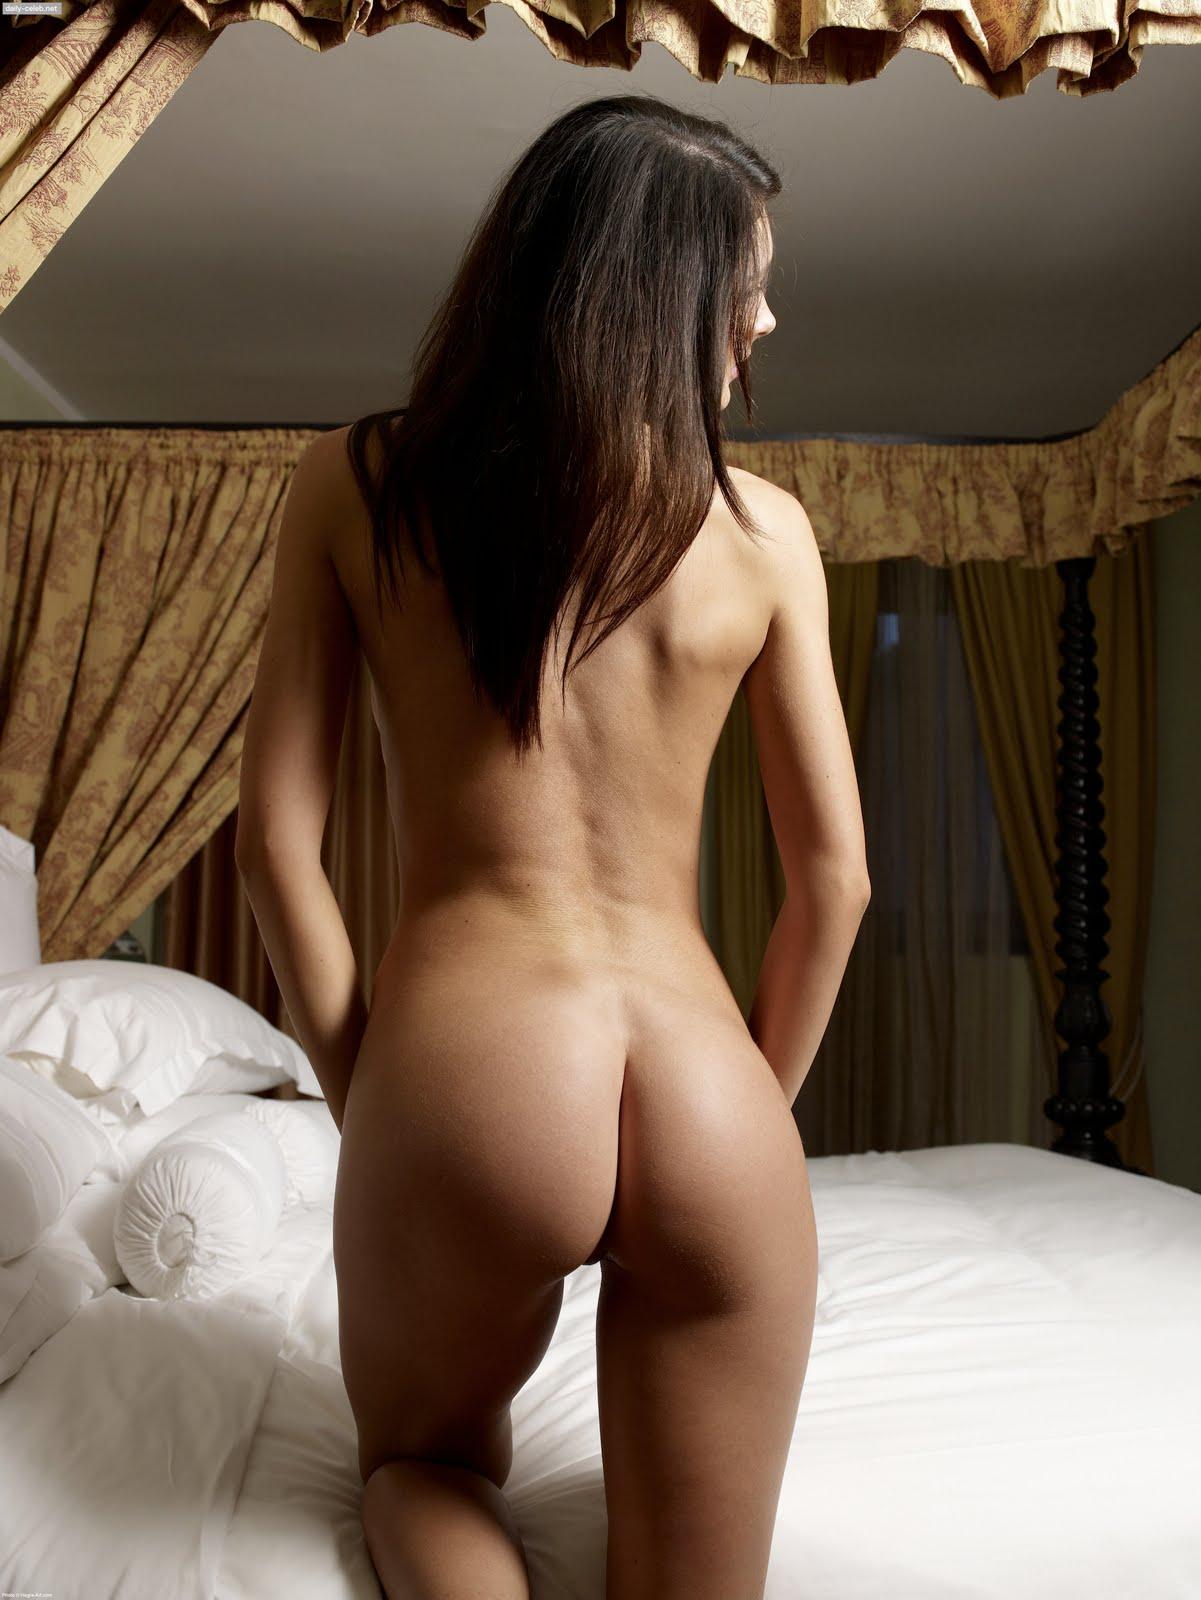 filipino male celebrities nude photos